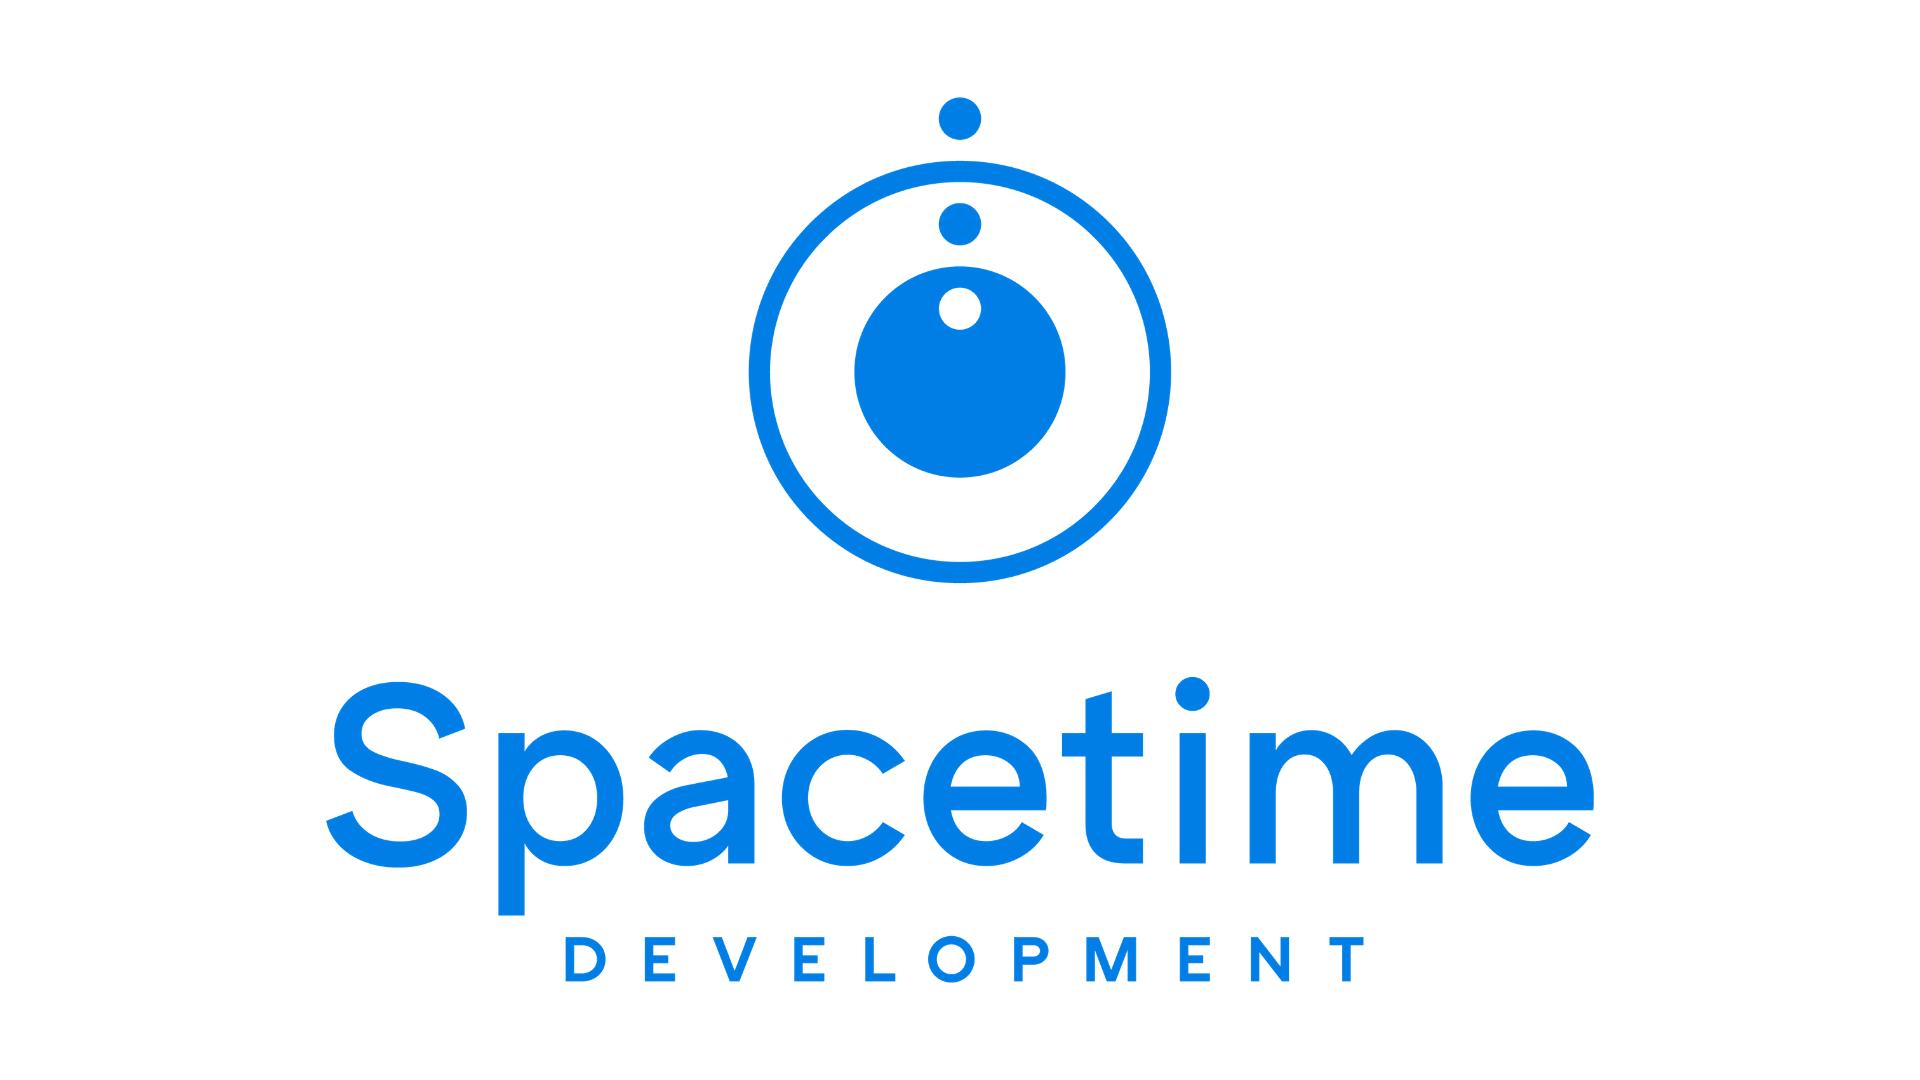 Spacetime Development Space Organisation Partner